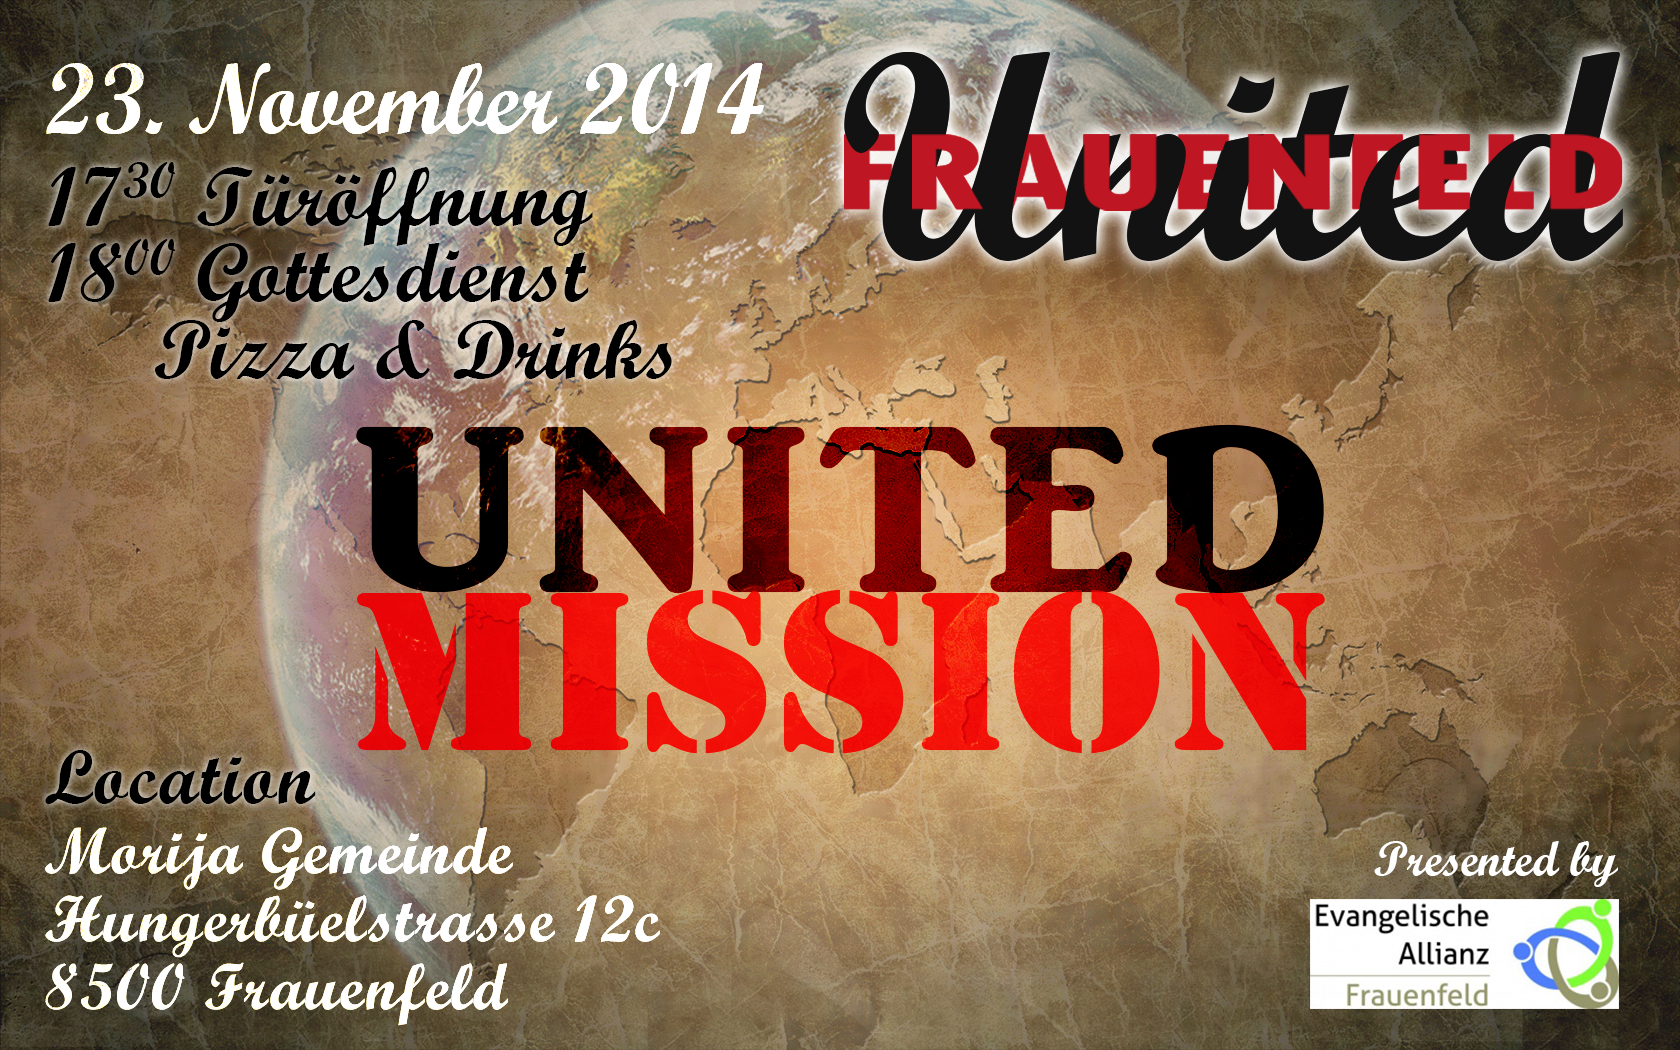 141123_Flyer_FFUnited_UnitedMission_v0-4